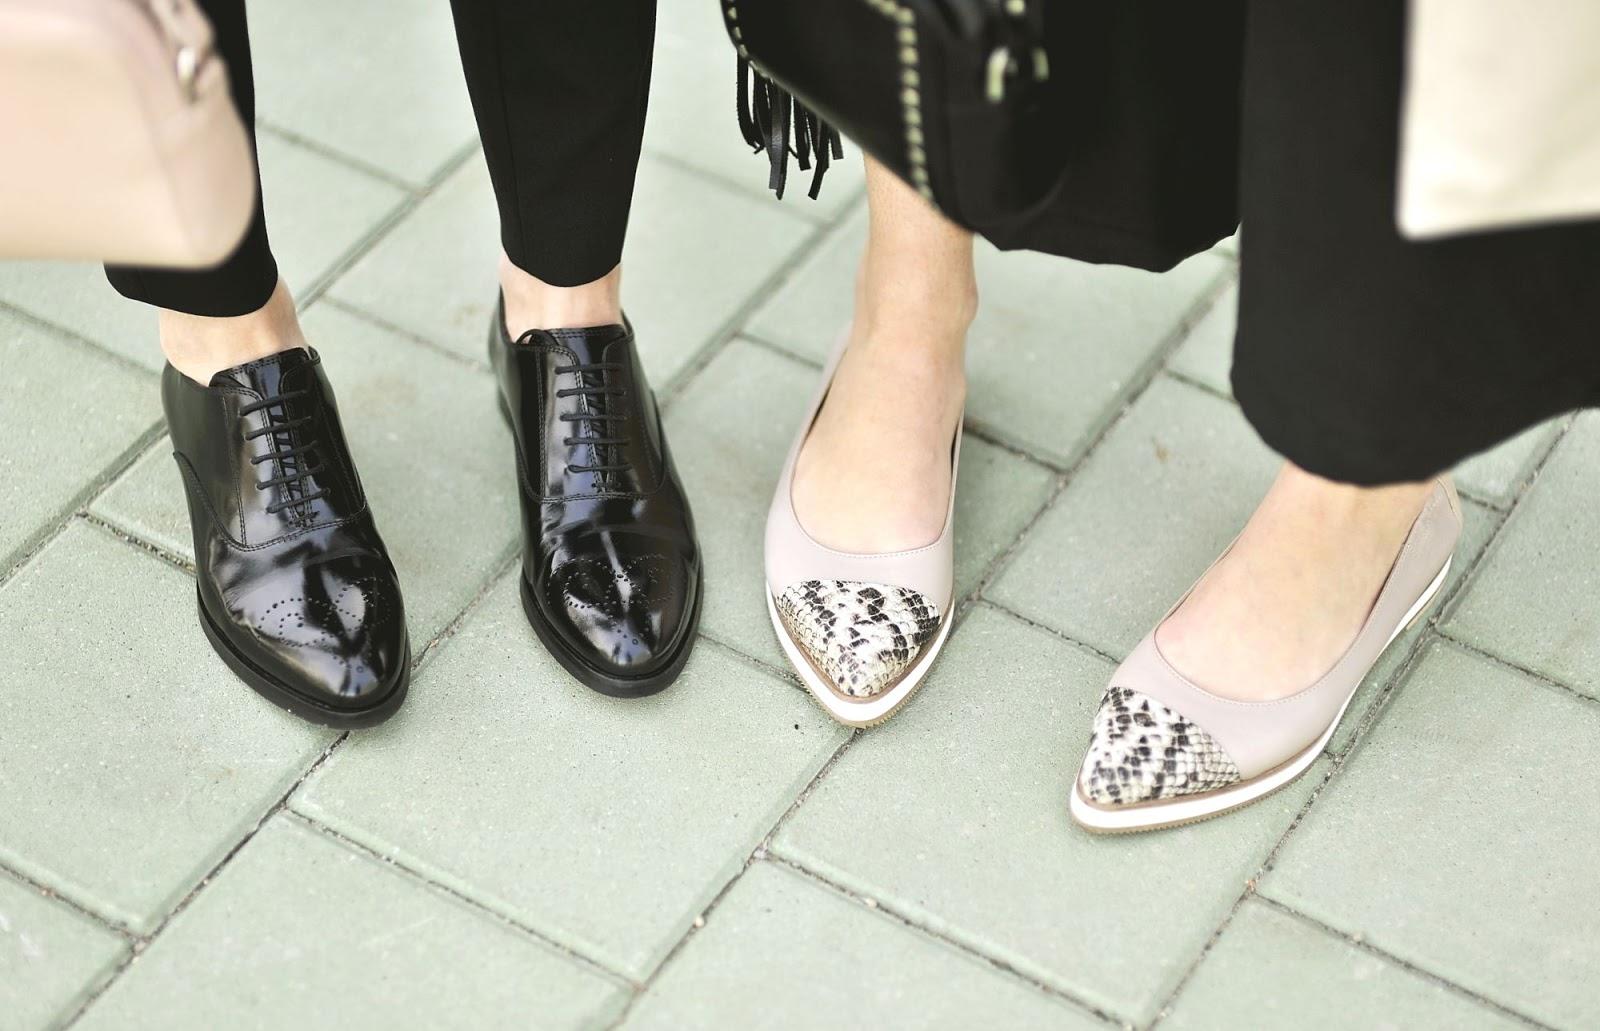 stylizacja do pracy | buty na wiosne | baleriny | shinysyl